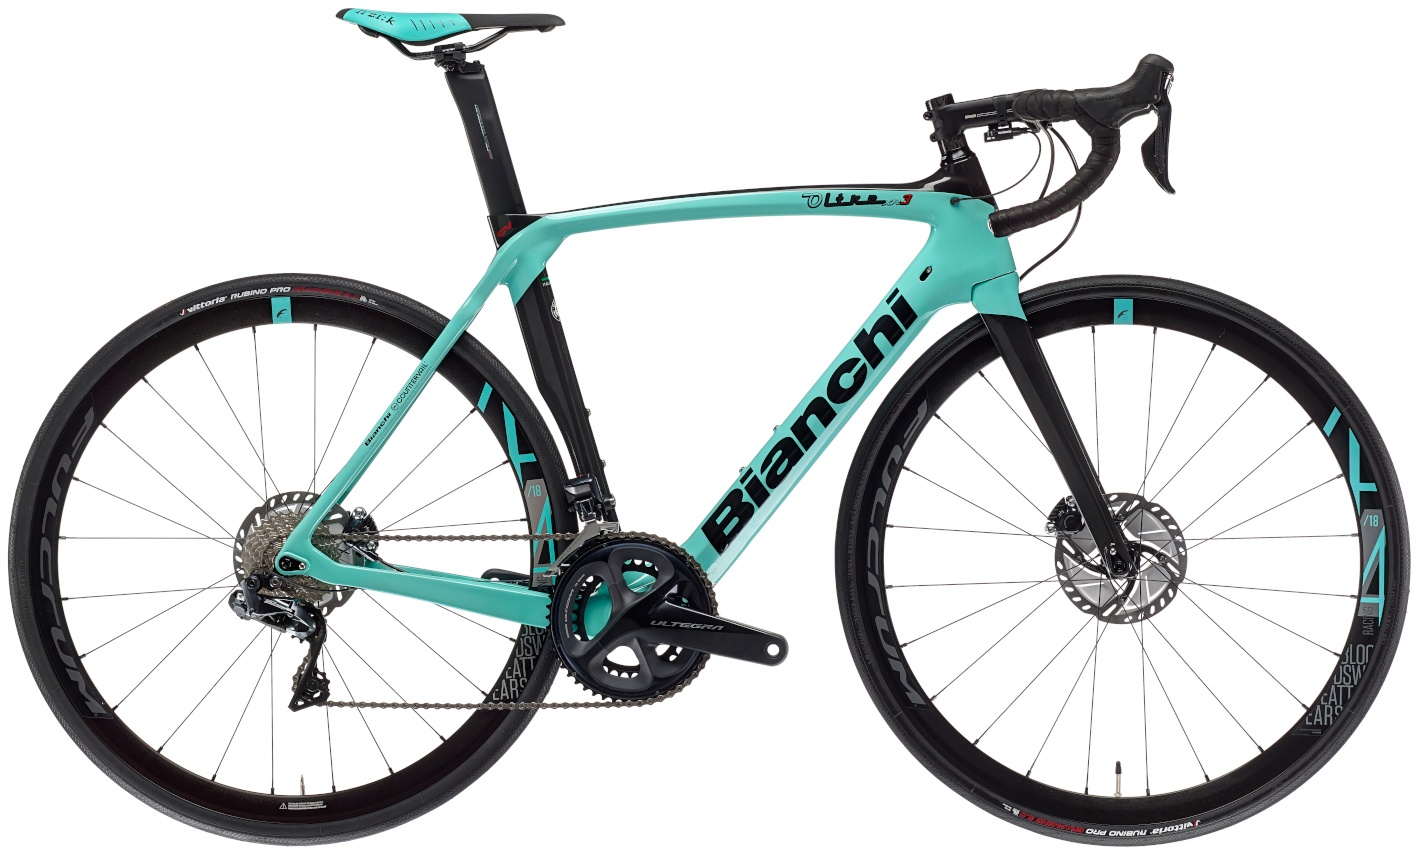 Bianchi Oltre XR3 Ultegra Di2 22g 2021